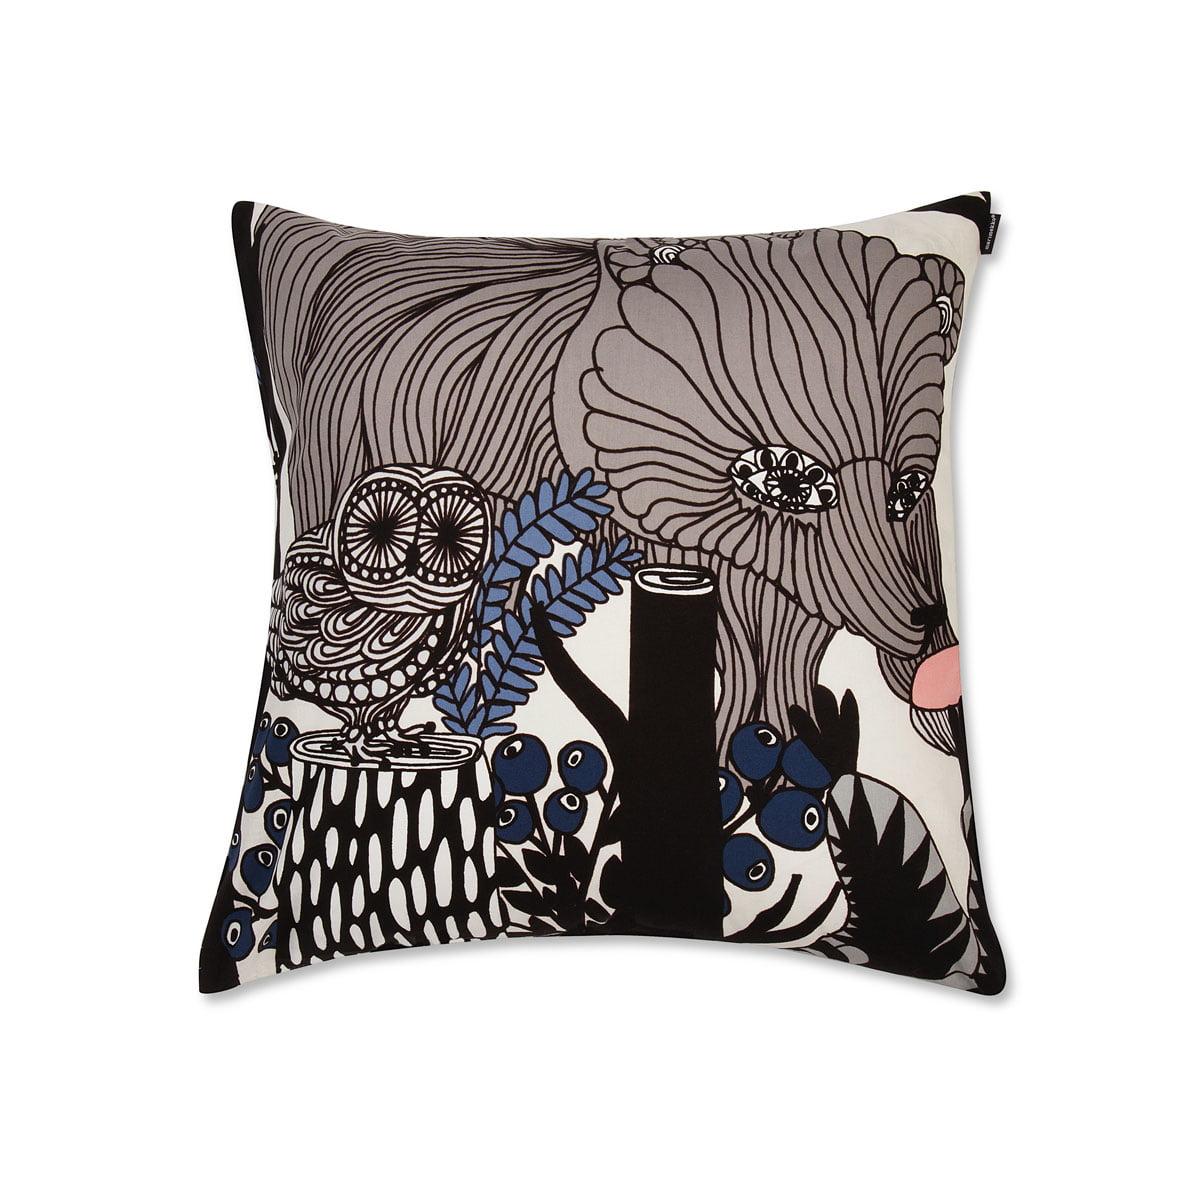 veljekset kissenbezug von marimekko connox. Black Bedroom Furniture Sets. Home Design Ideas